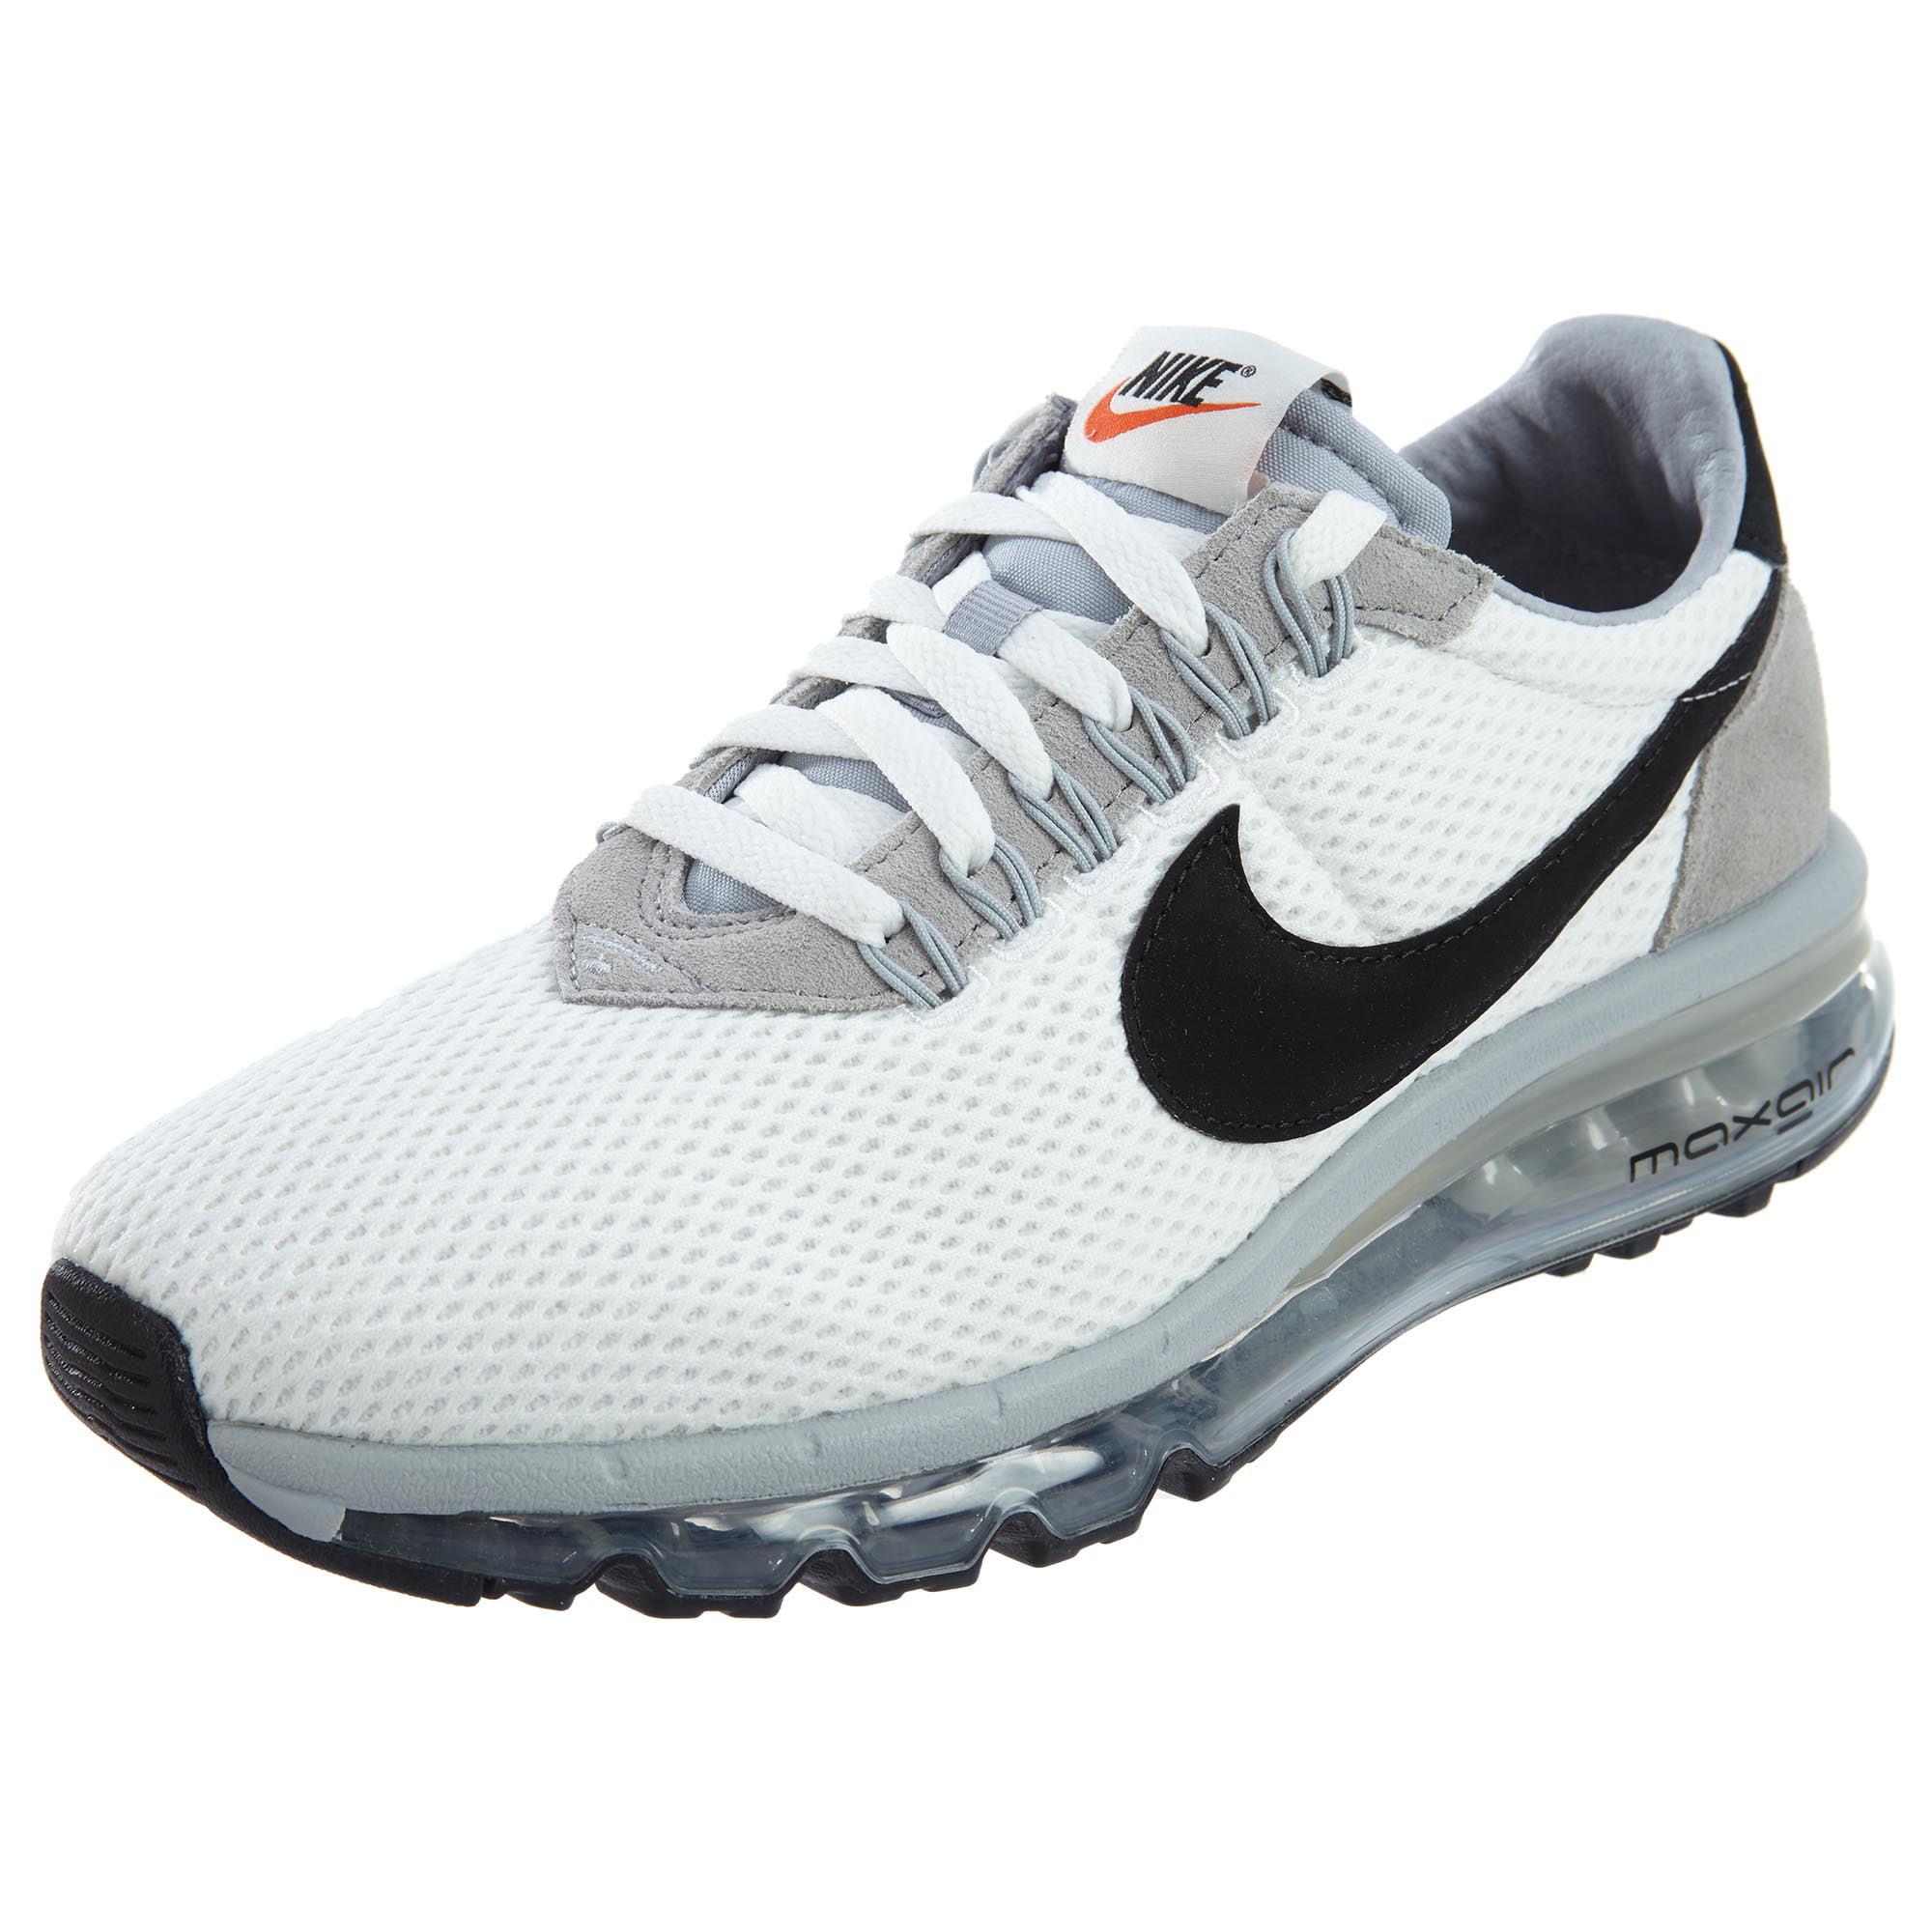 Contando insectos Empotrar Noroeste  Nike - Nike Air Max Ld-zero Mens Style : 848624 - Walmart.com - Walmart.com